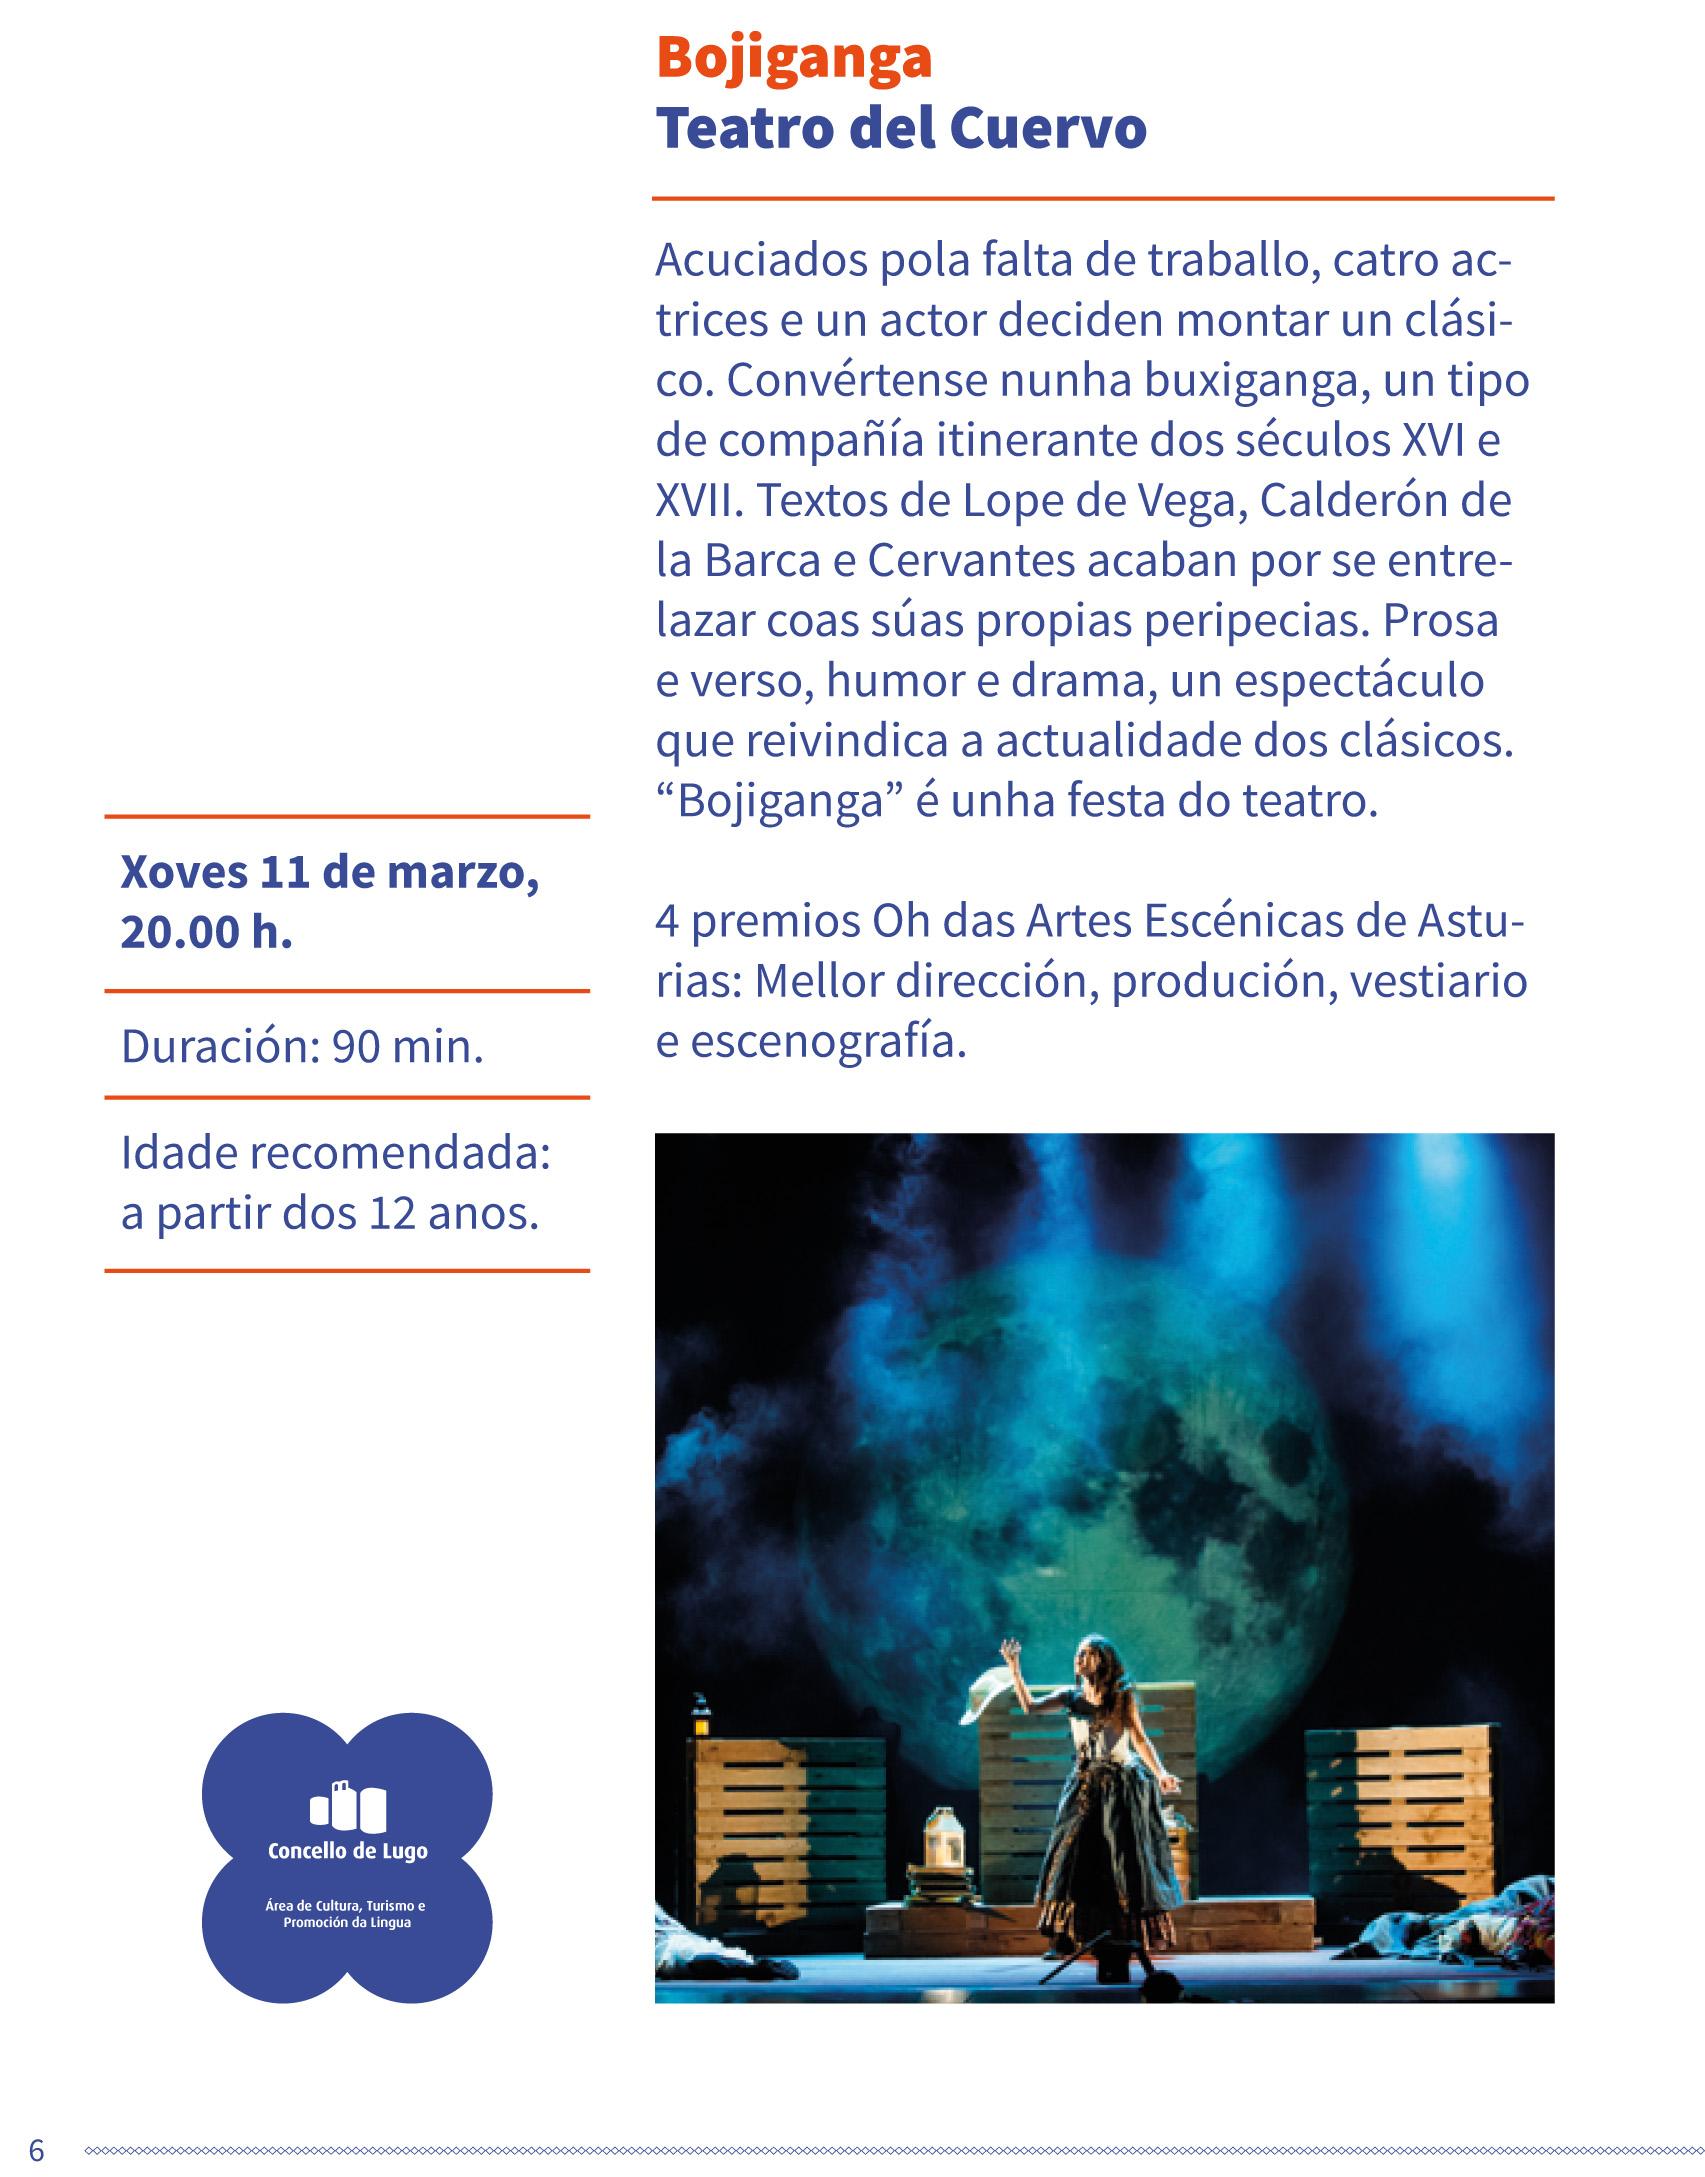 Teatro clásico no Gustavo Freire - Bojiganga